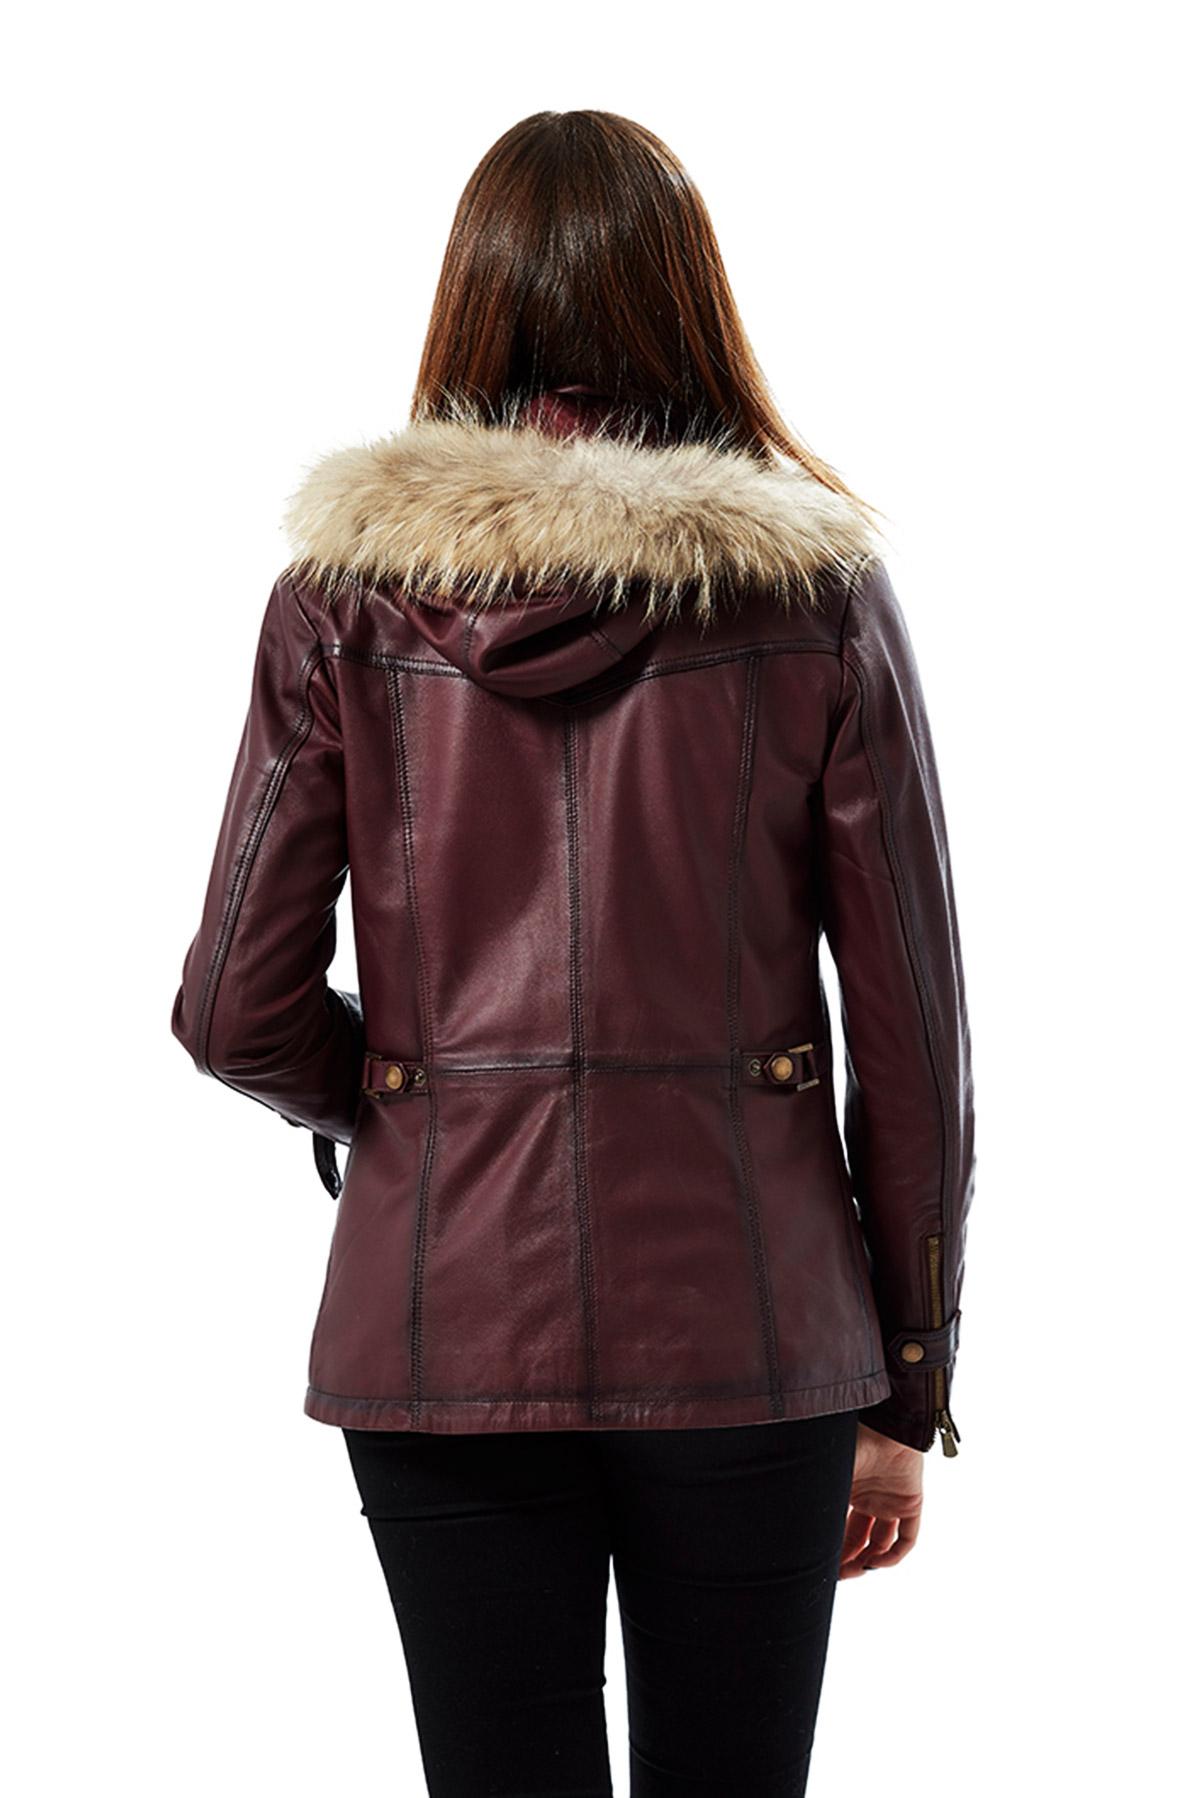 oxblood leather jacket womens